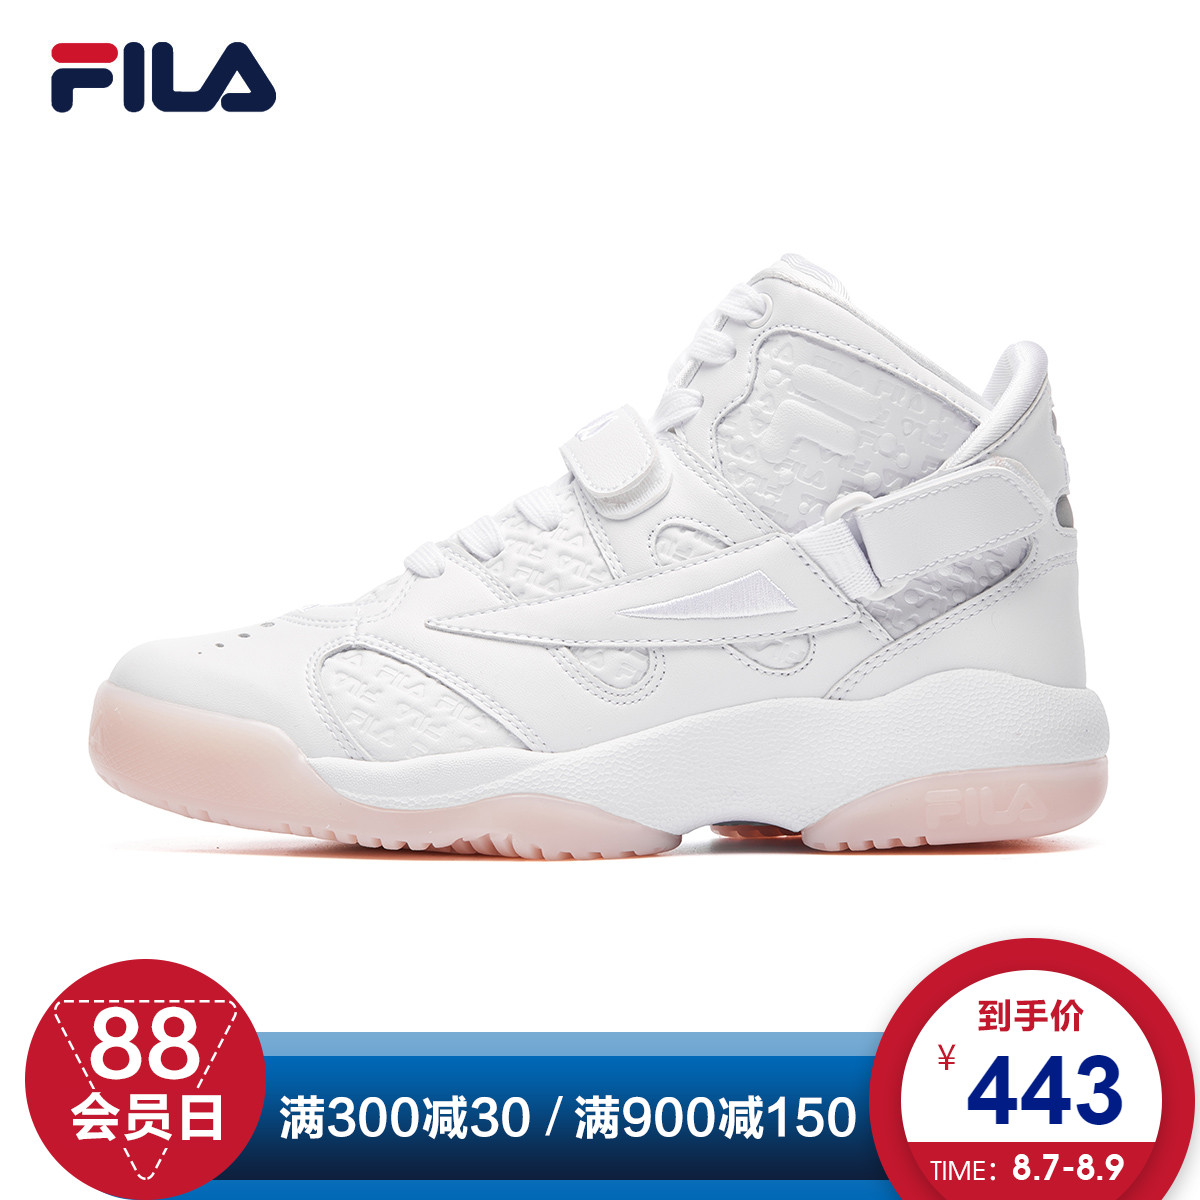 FILA斐乐正品女子篮球鞋2019春季新款运动休闲鞋女鞋